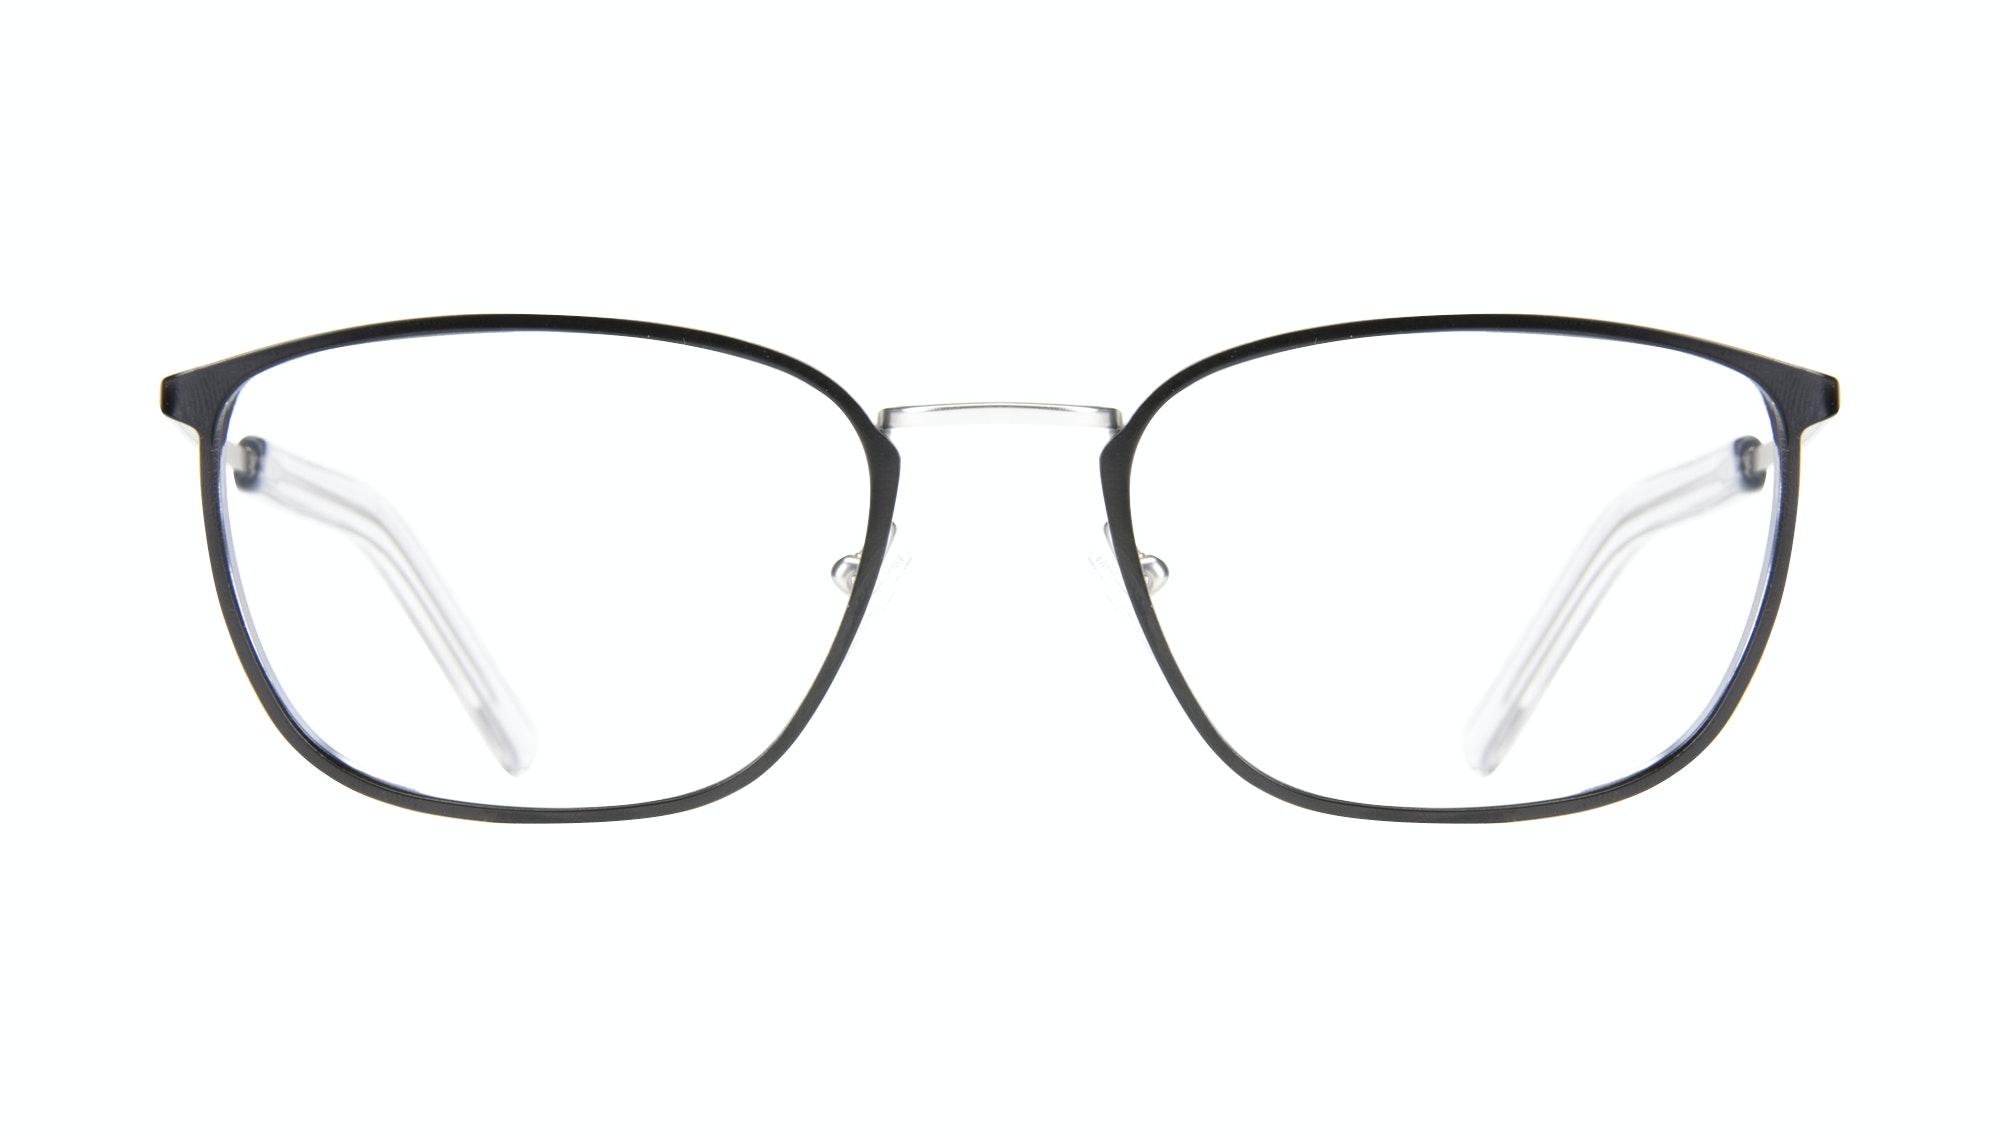 Affordable Fashion Glasses Rectangle Eyeglasses Men Edge Black Silver